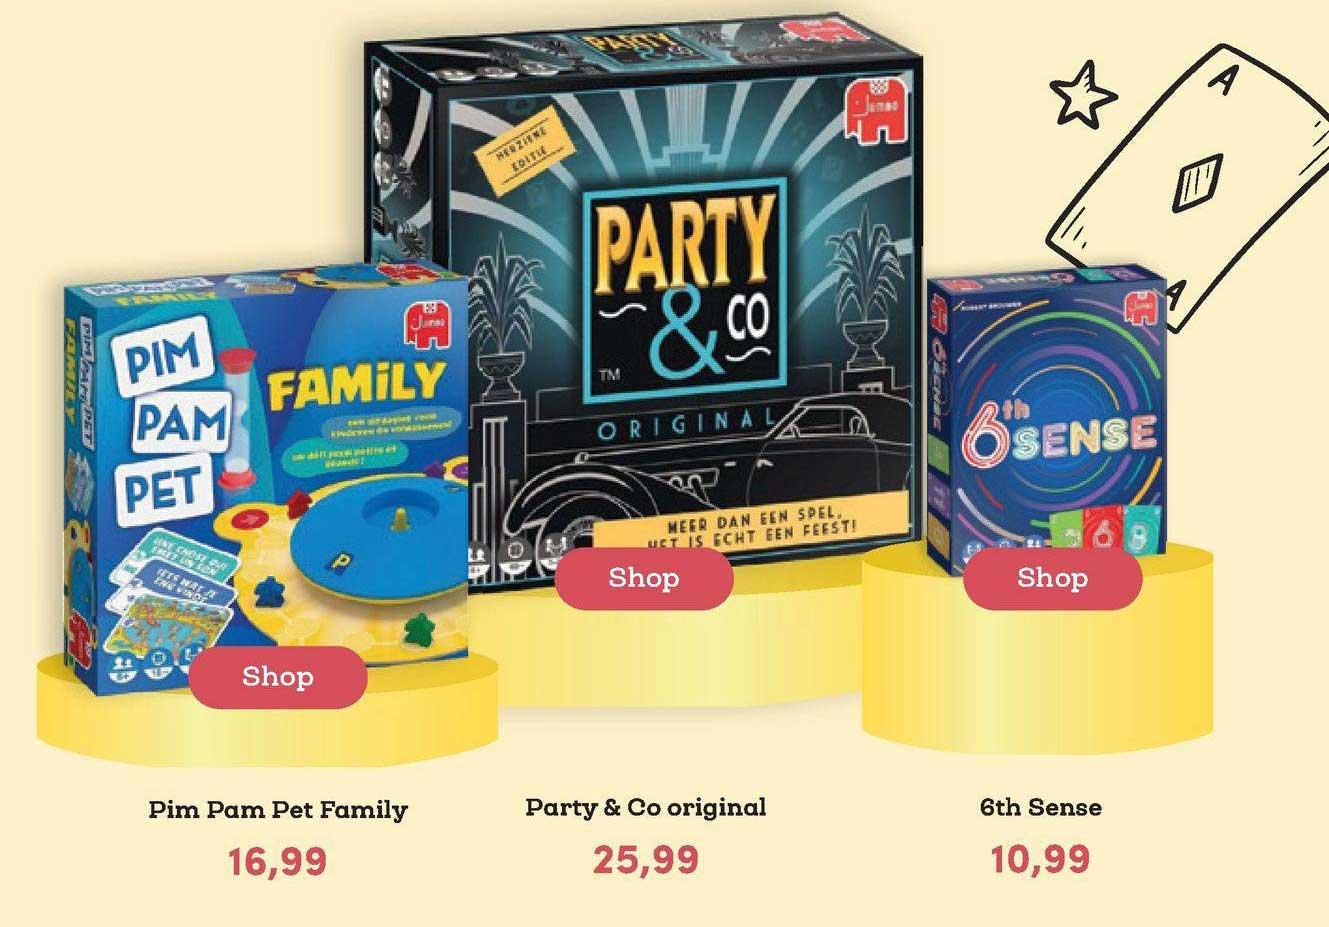 BookSpot Pim Pam Pet Family, Party & Co Original Of 6th Sense